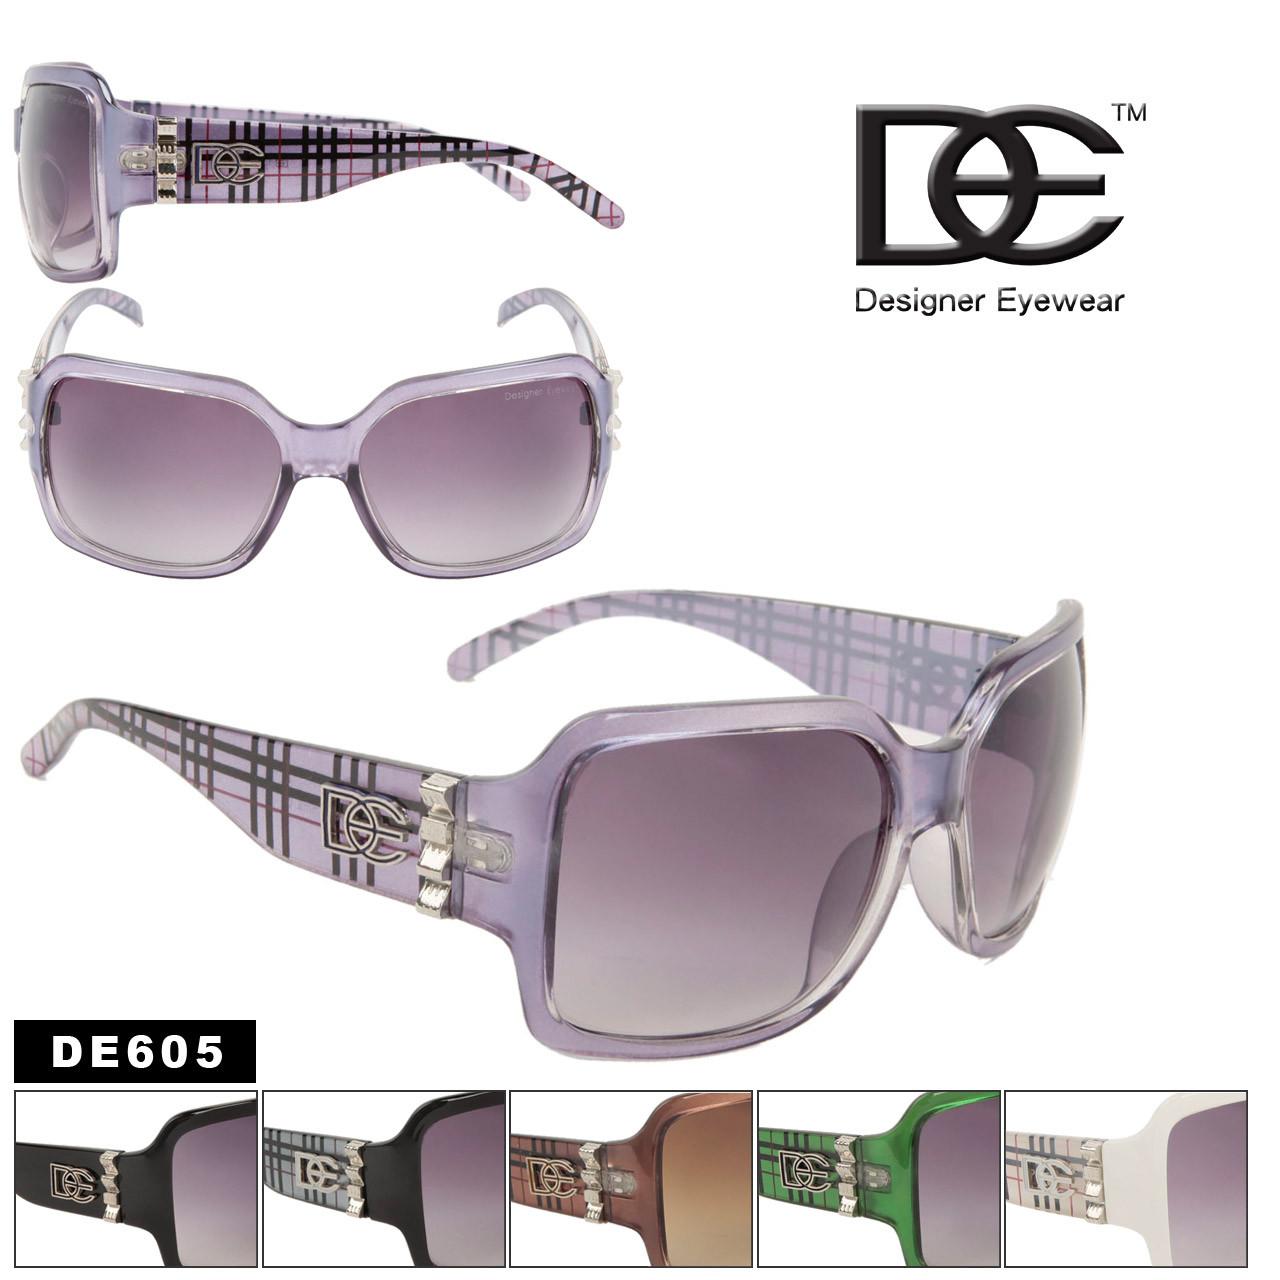 DE Designer Eyewear Fashion Sunglasses